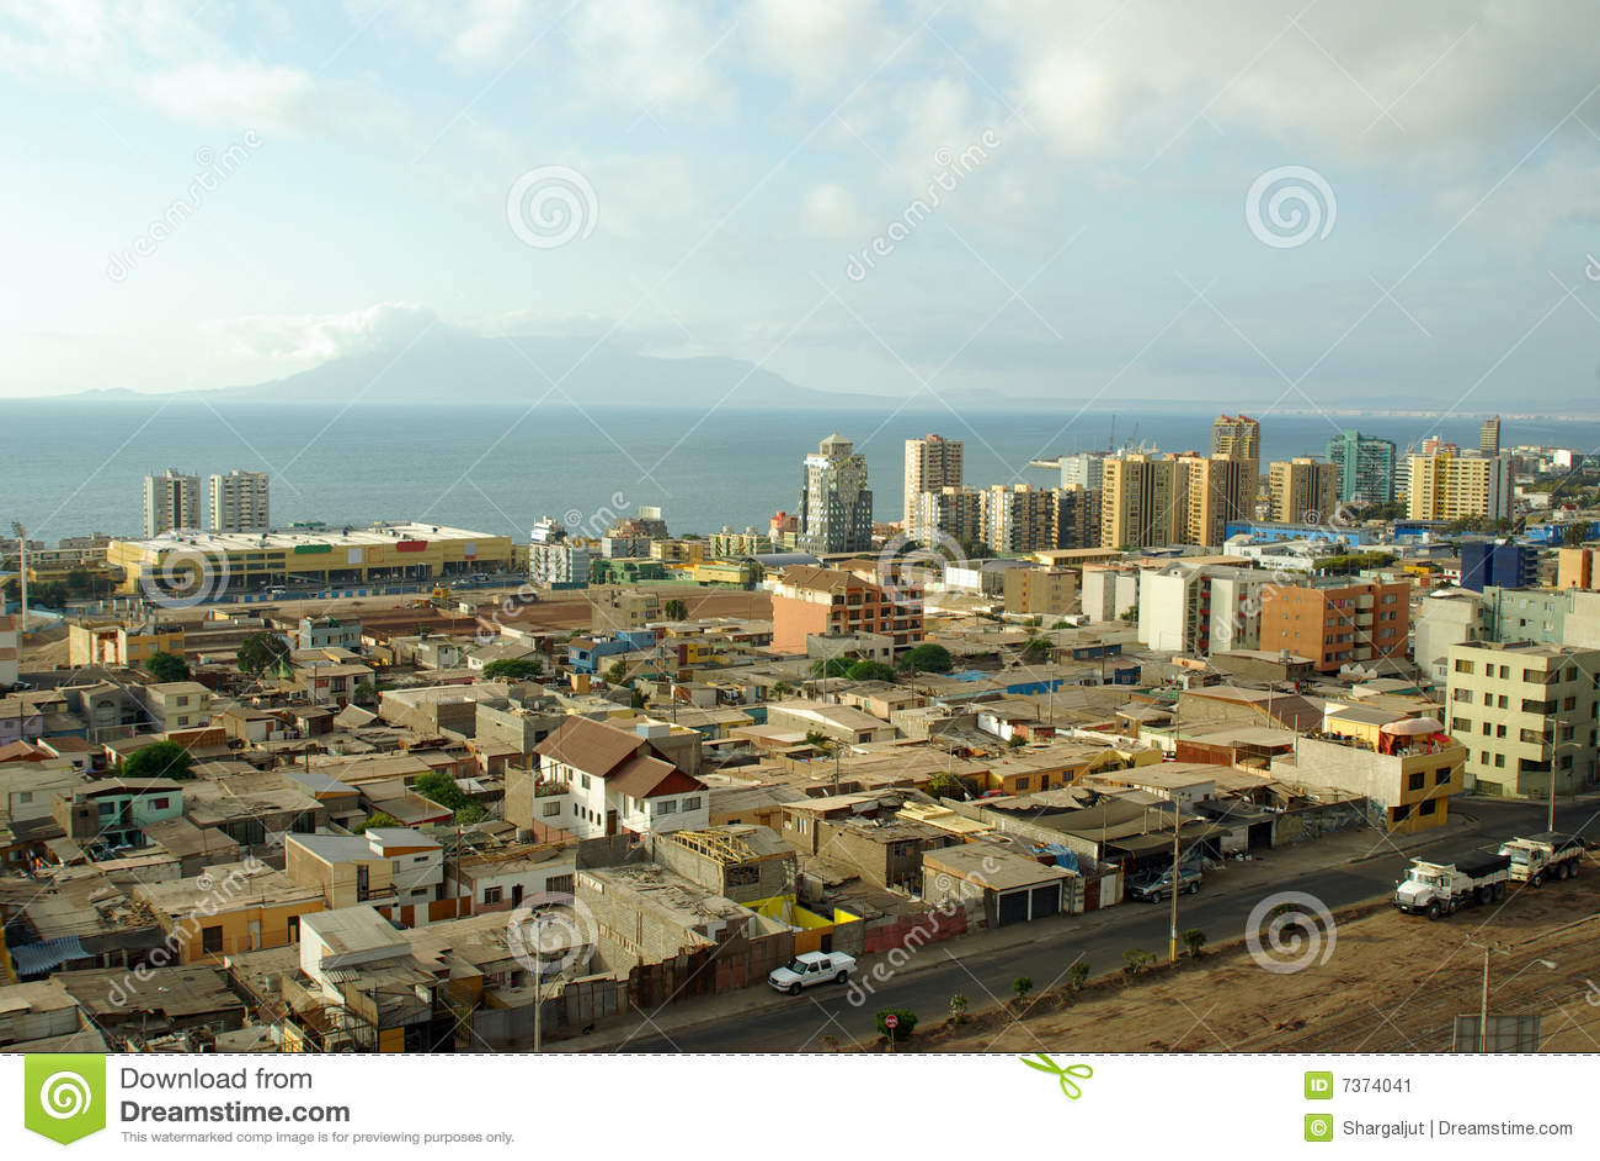 Antofagasta Chile  City pictures : Antofagasta, Chile Stock Image Image: 7374041